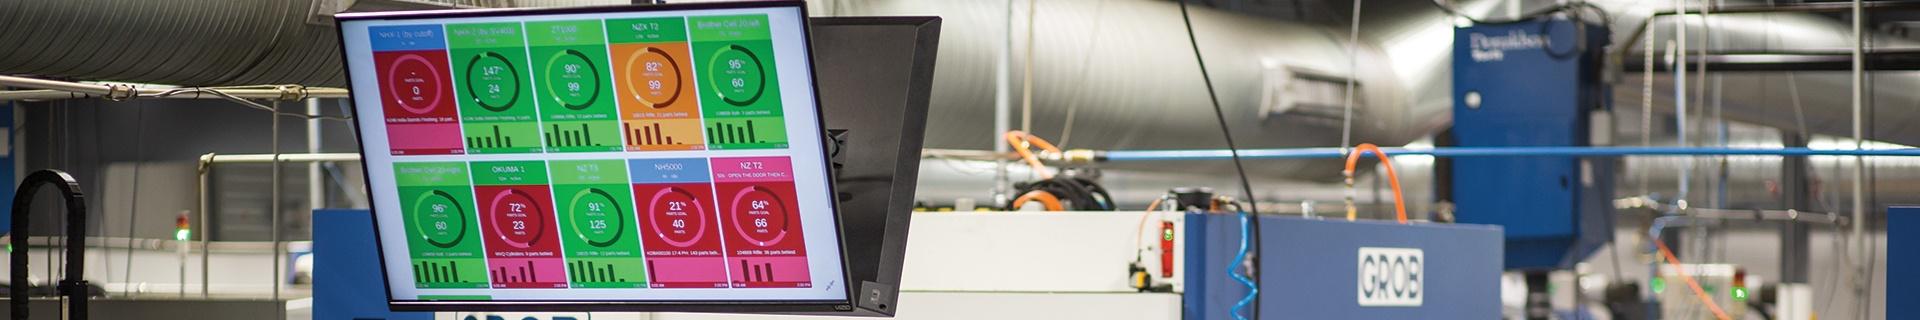 Precision Metalworking CNC Machine Monitoring Software | MachineMetrics